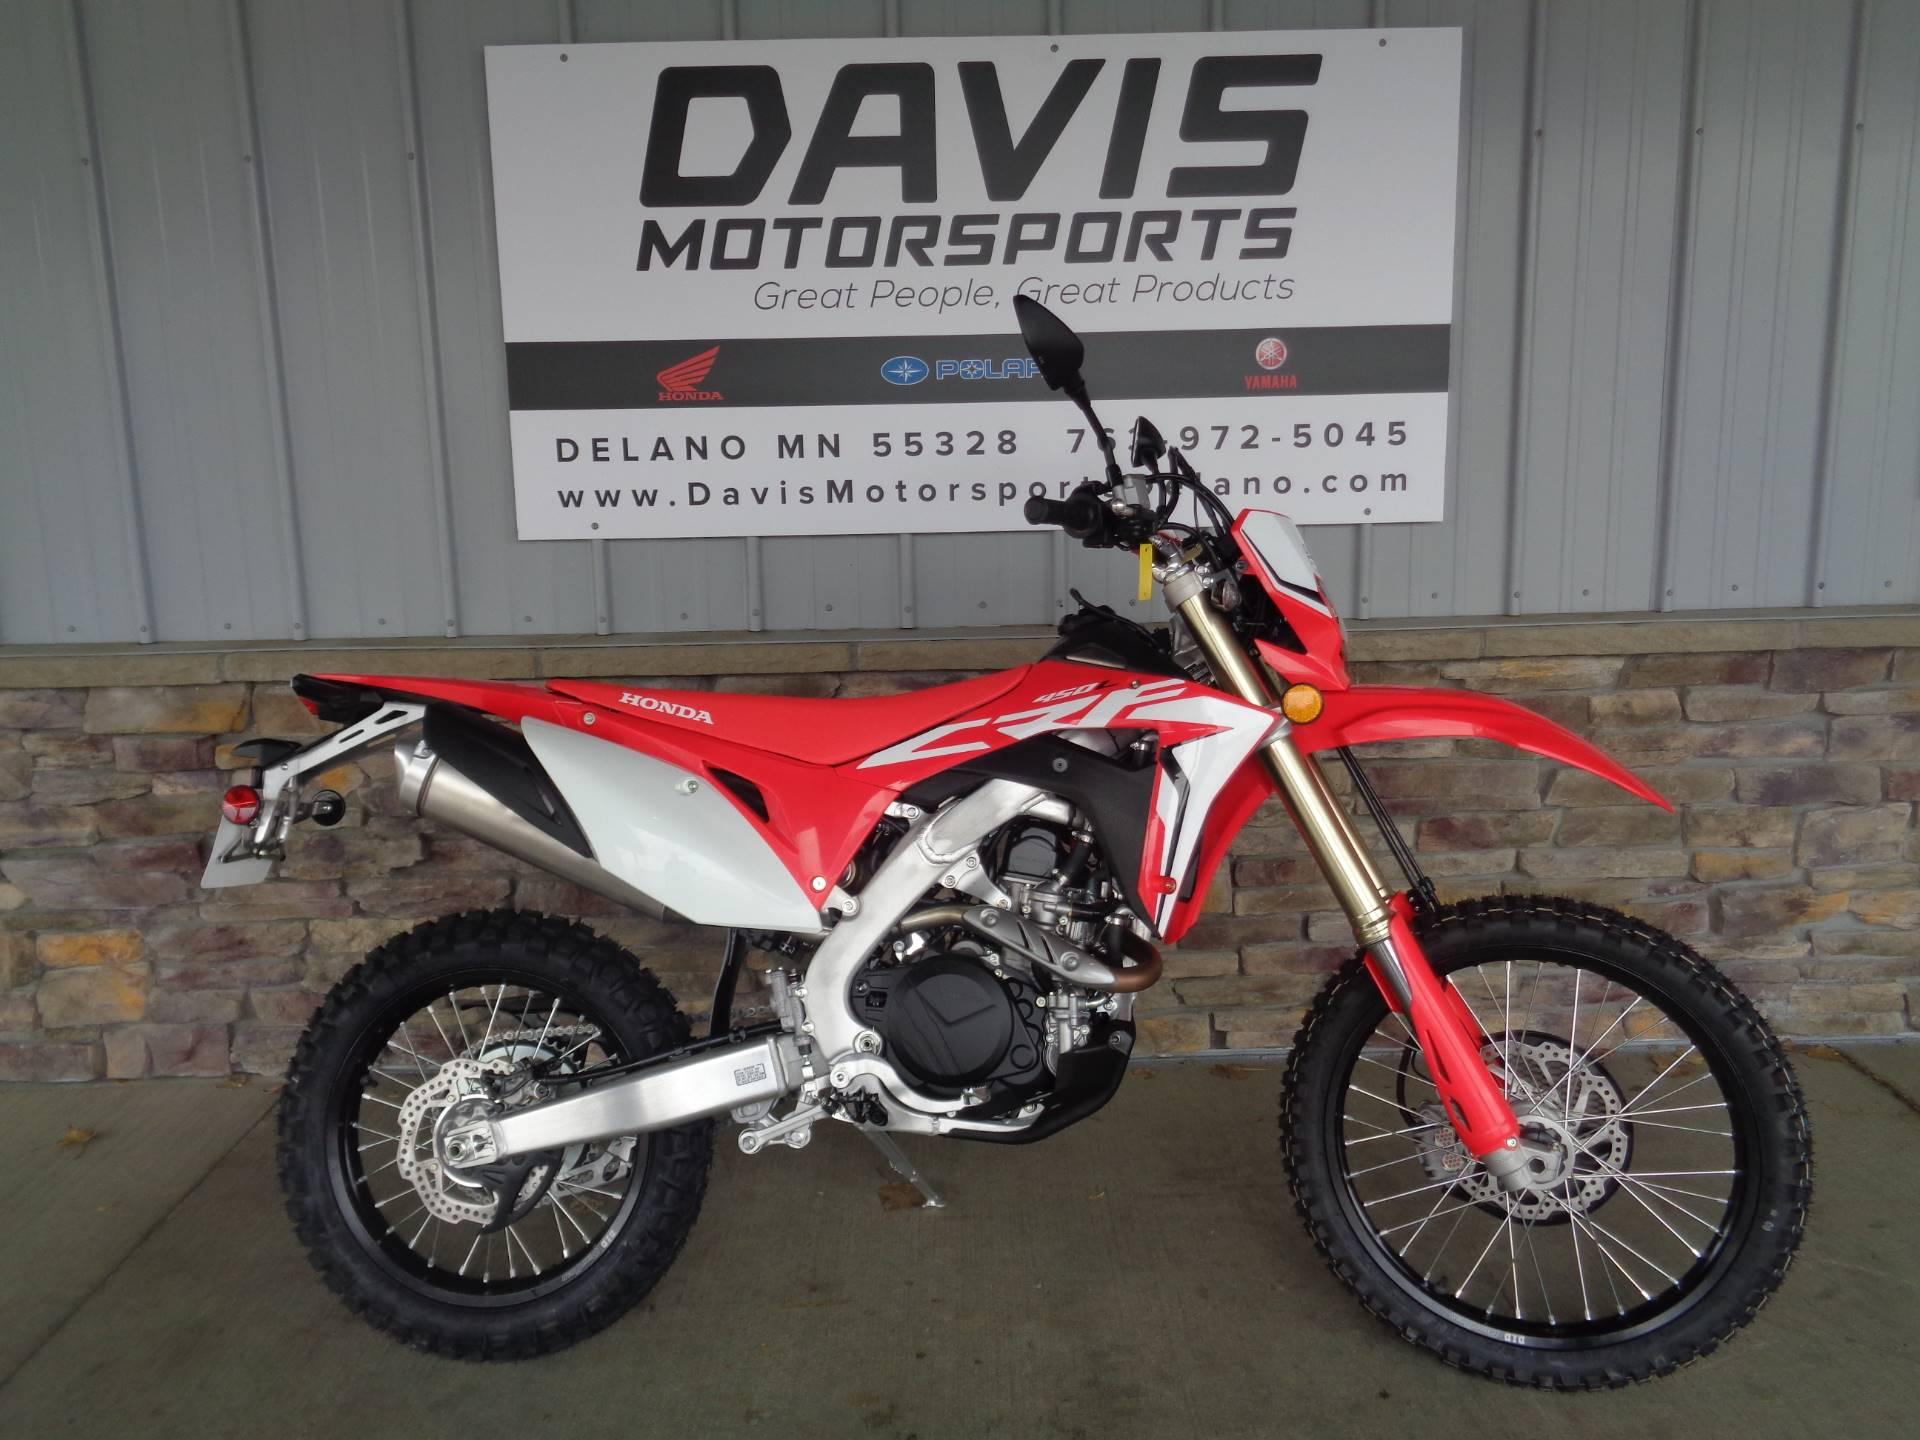 New 2019 Honda Crf450l Motorcycles In Delano Mn Na Red